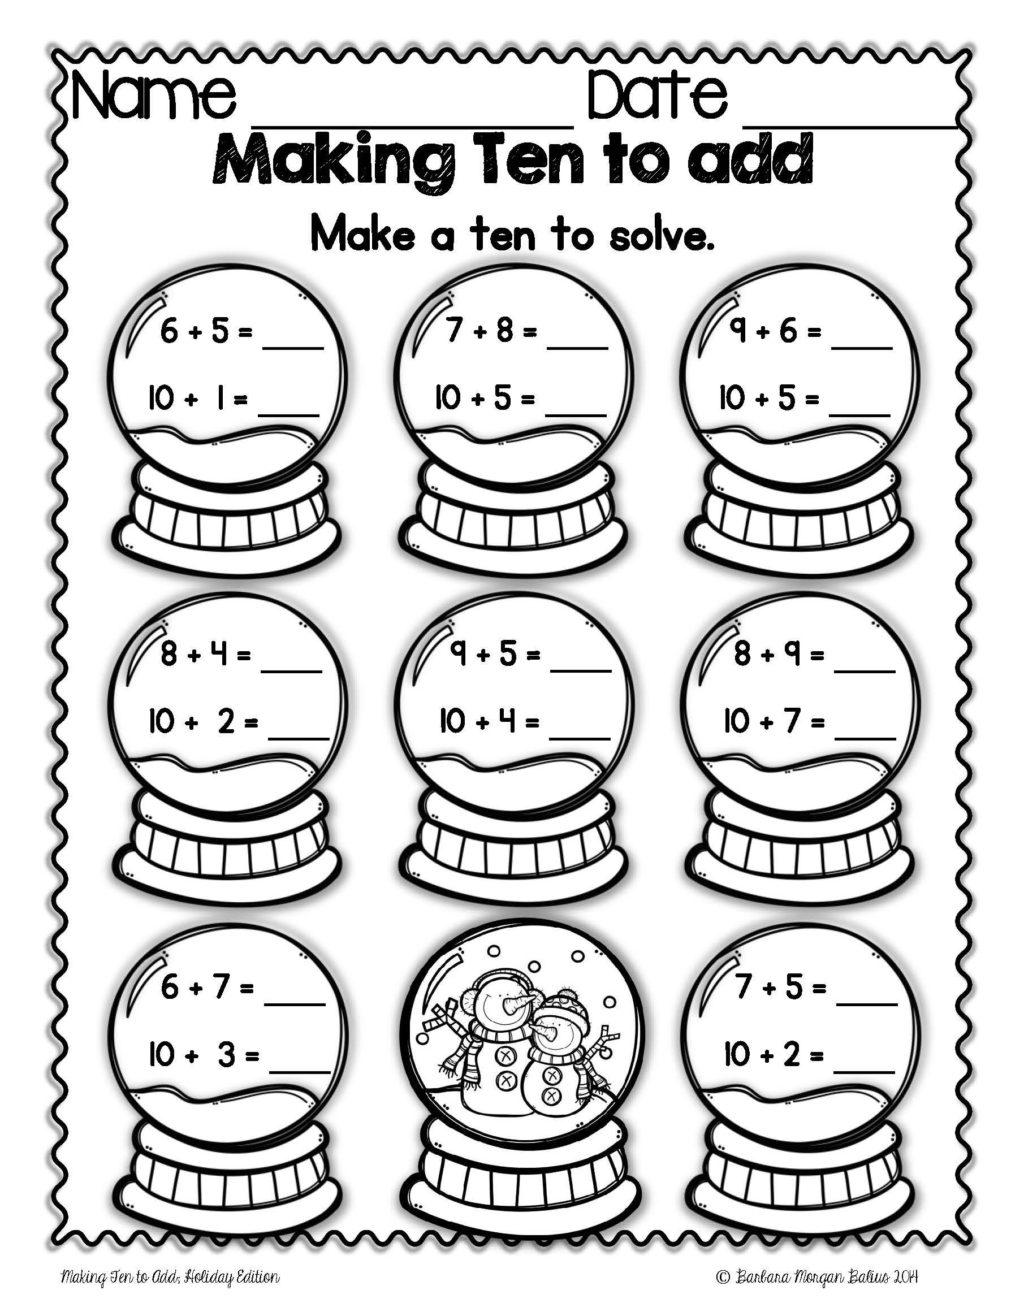 Worksheet ~ Halloween Math Worksheets 2Nd Grade Fun Coloring